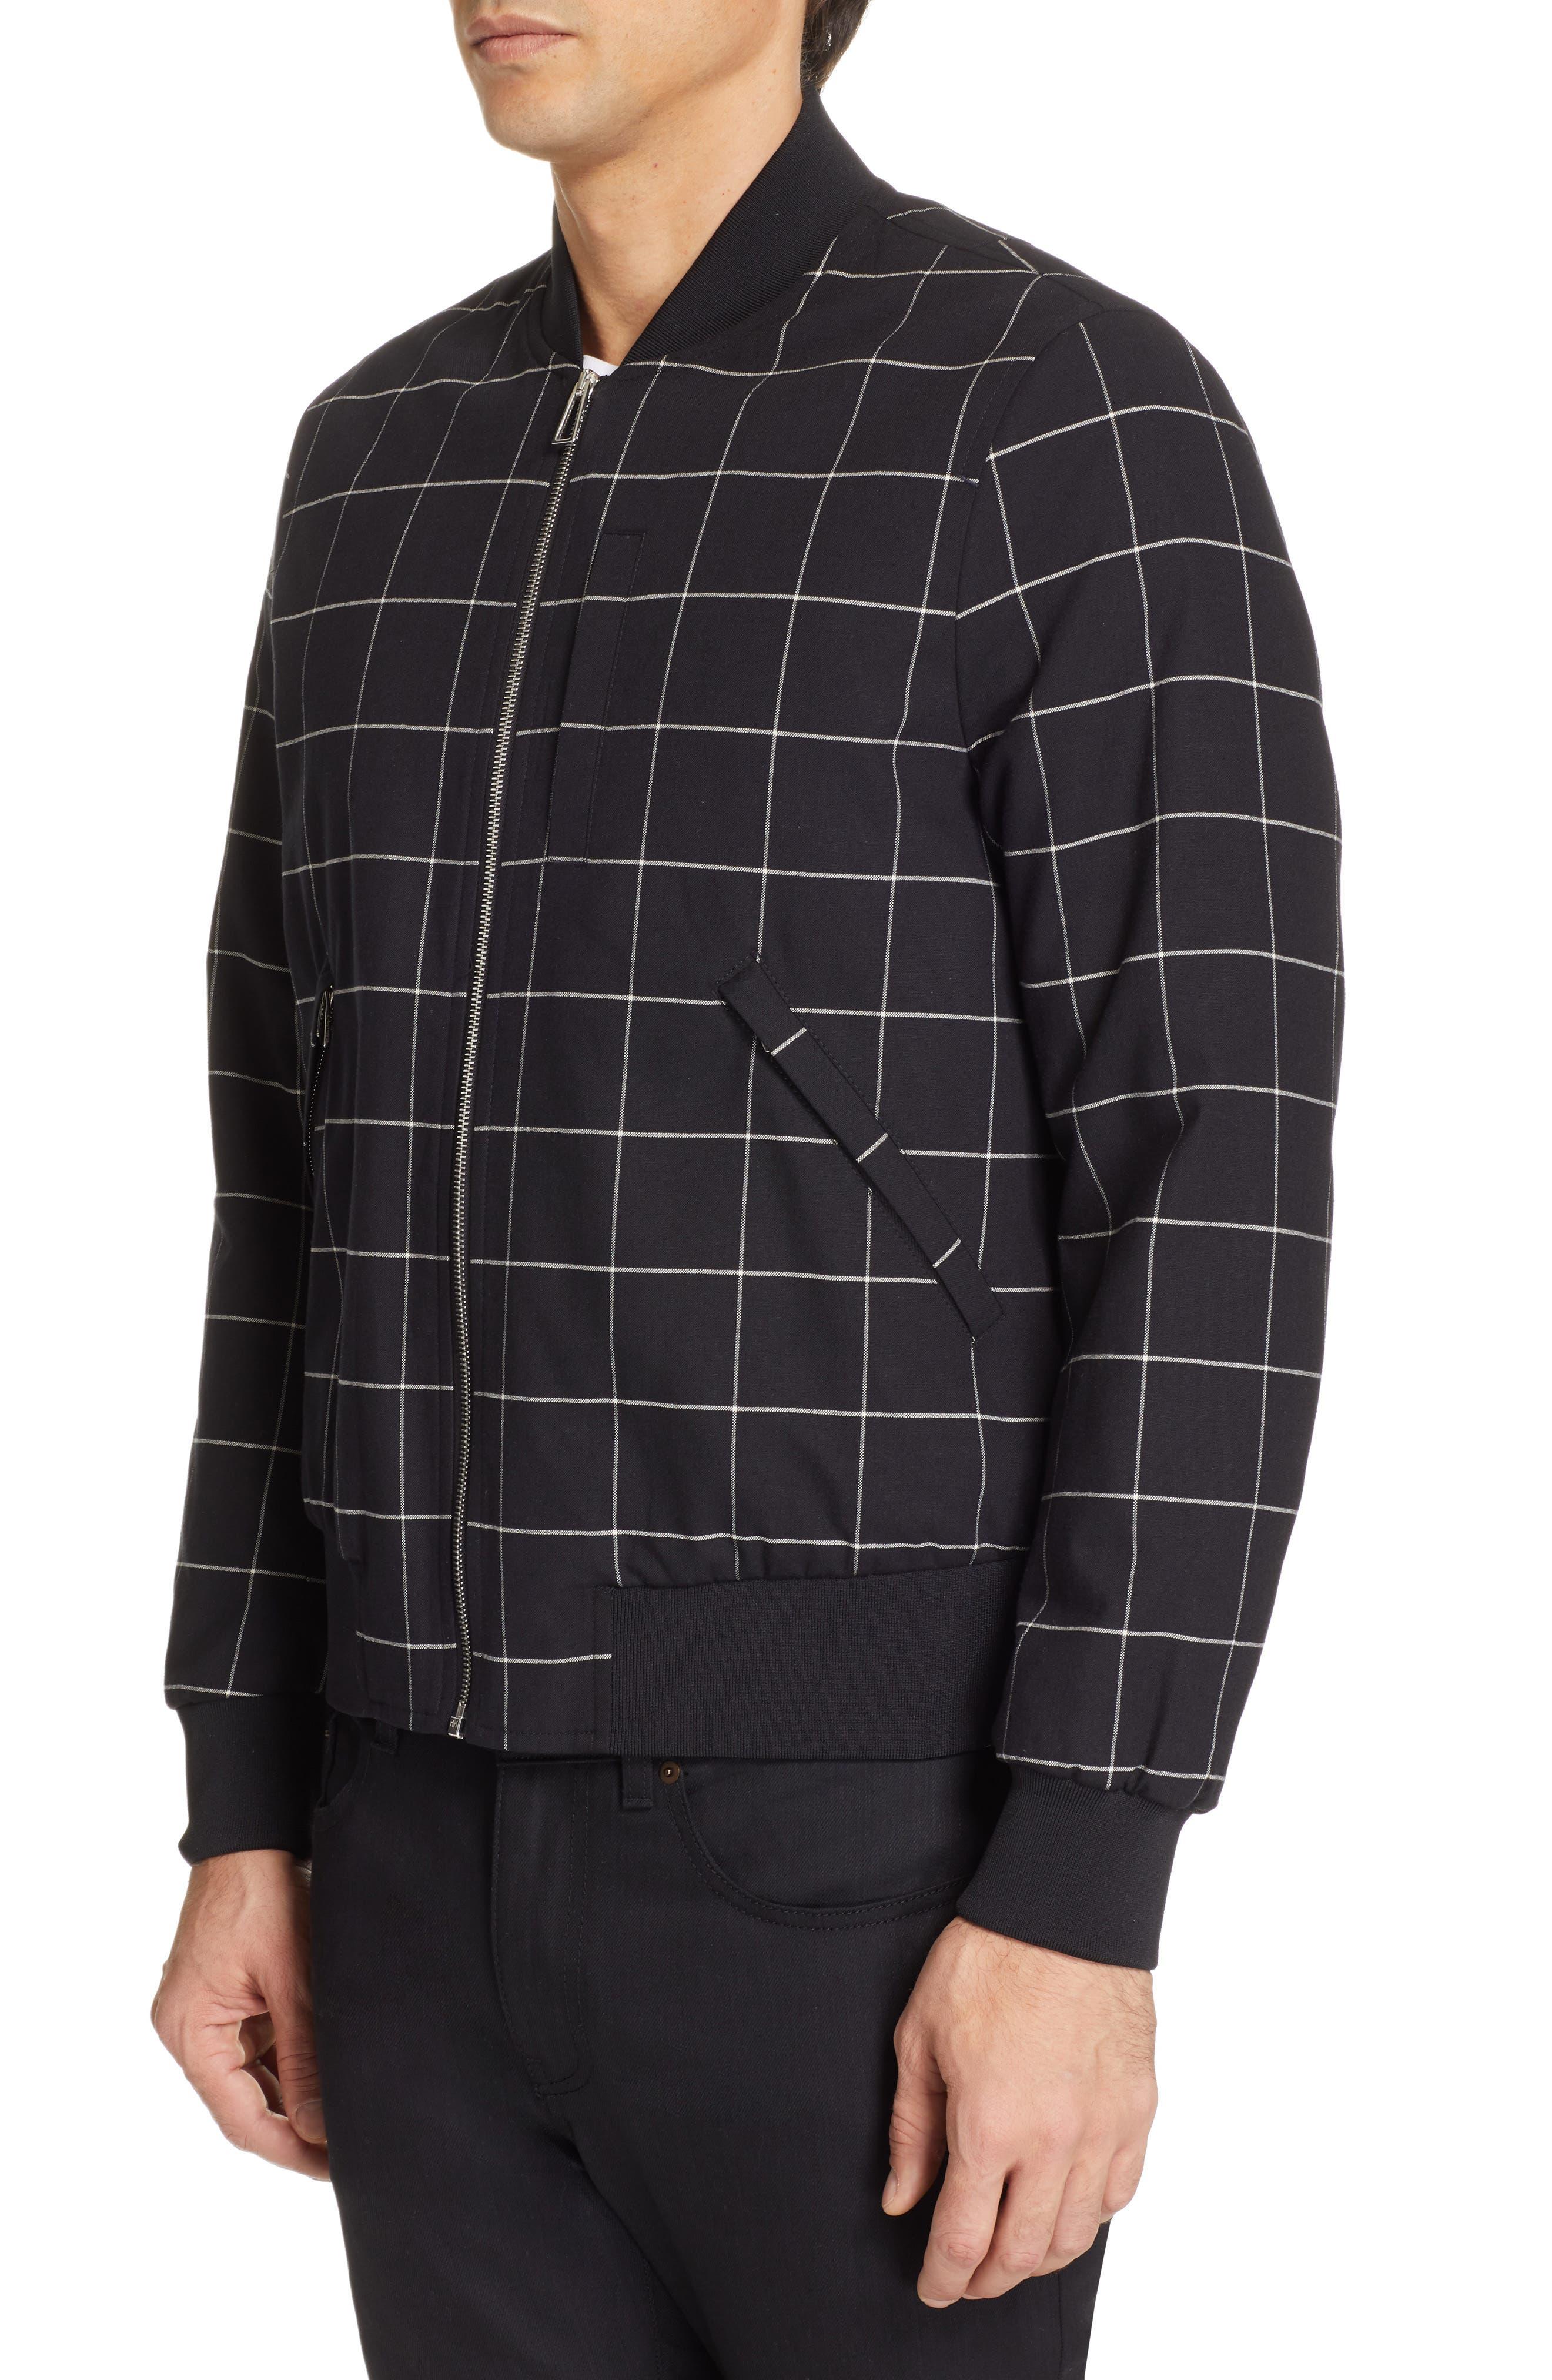 PS PAUL SMITH, Grid Wool Blend Bomber Jacket, Alternate thumbnail 4, color, BLACK